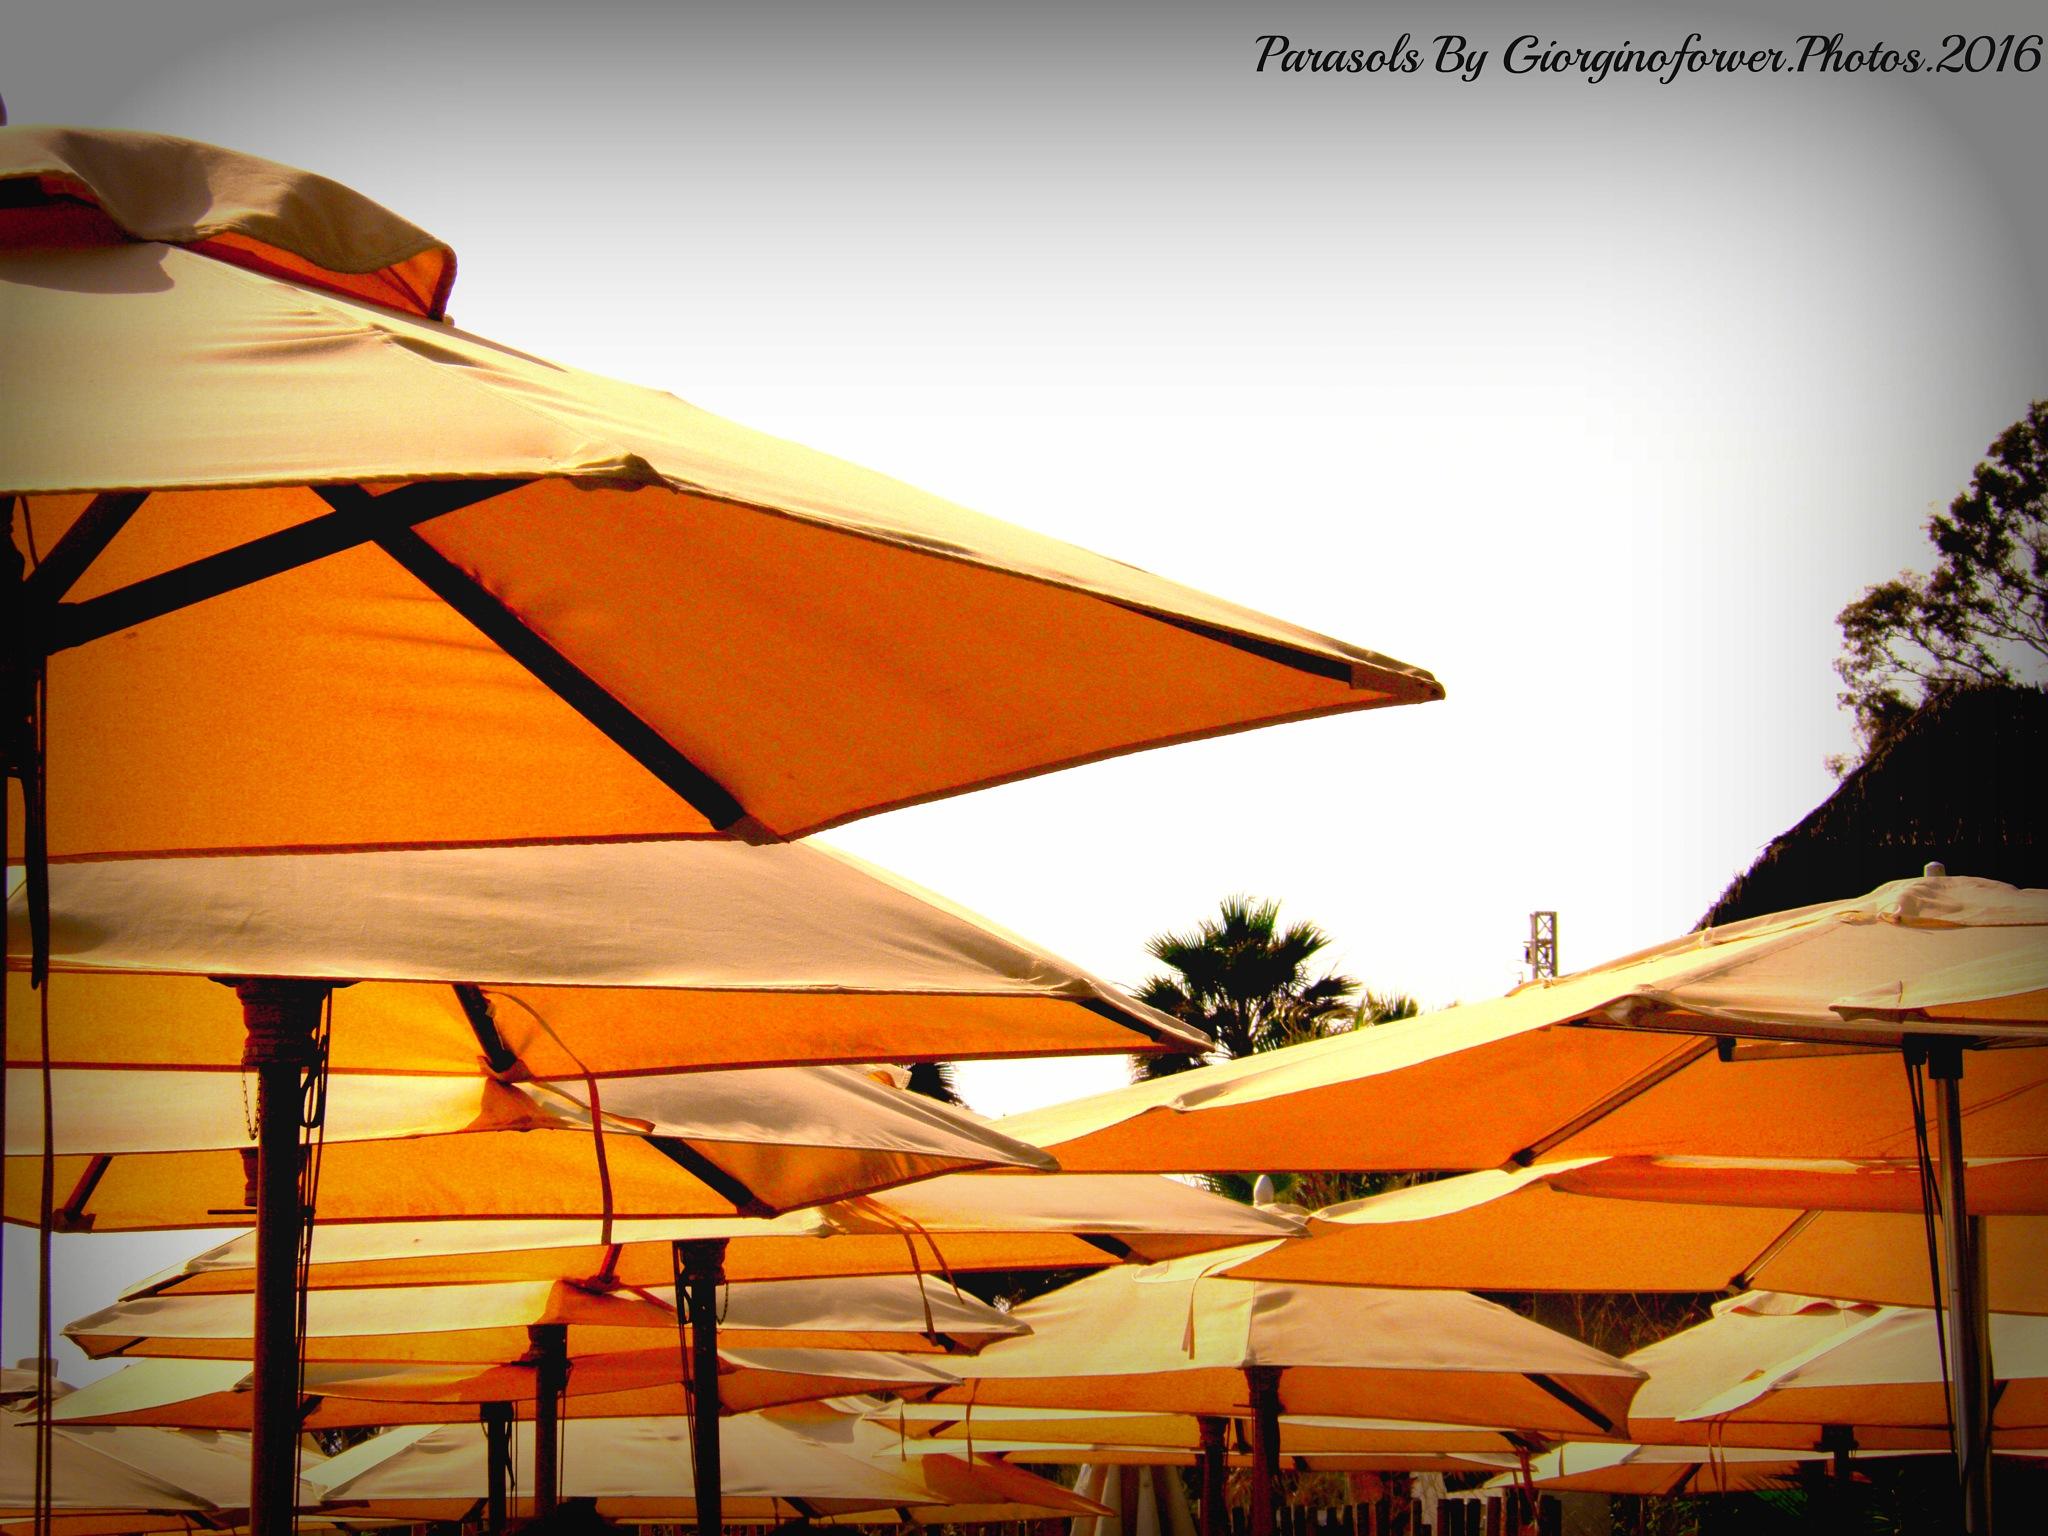 So many parasols .... by karenanne.borsani